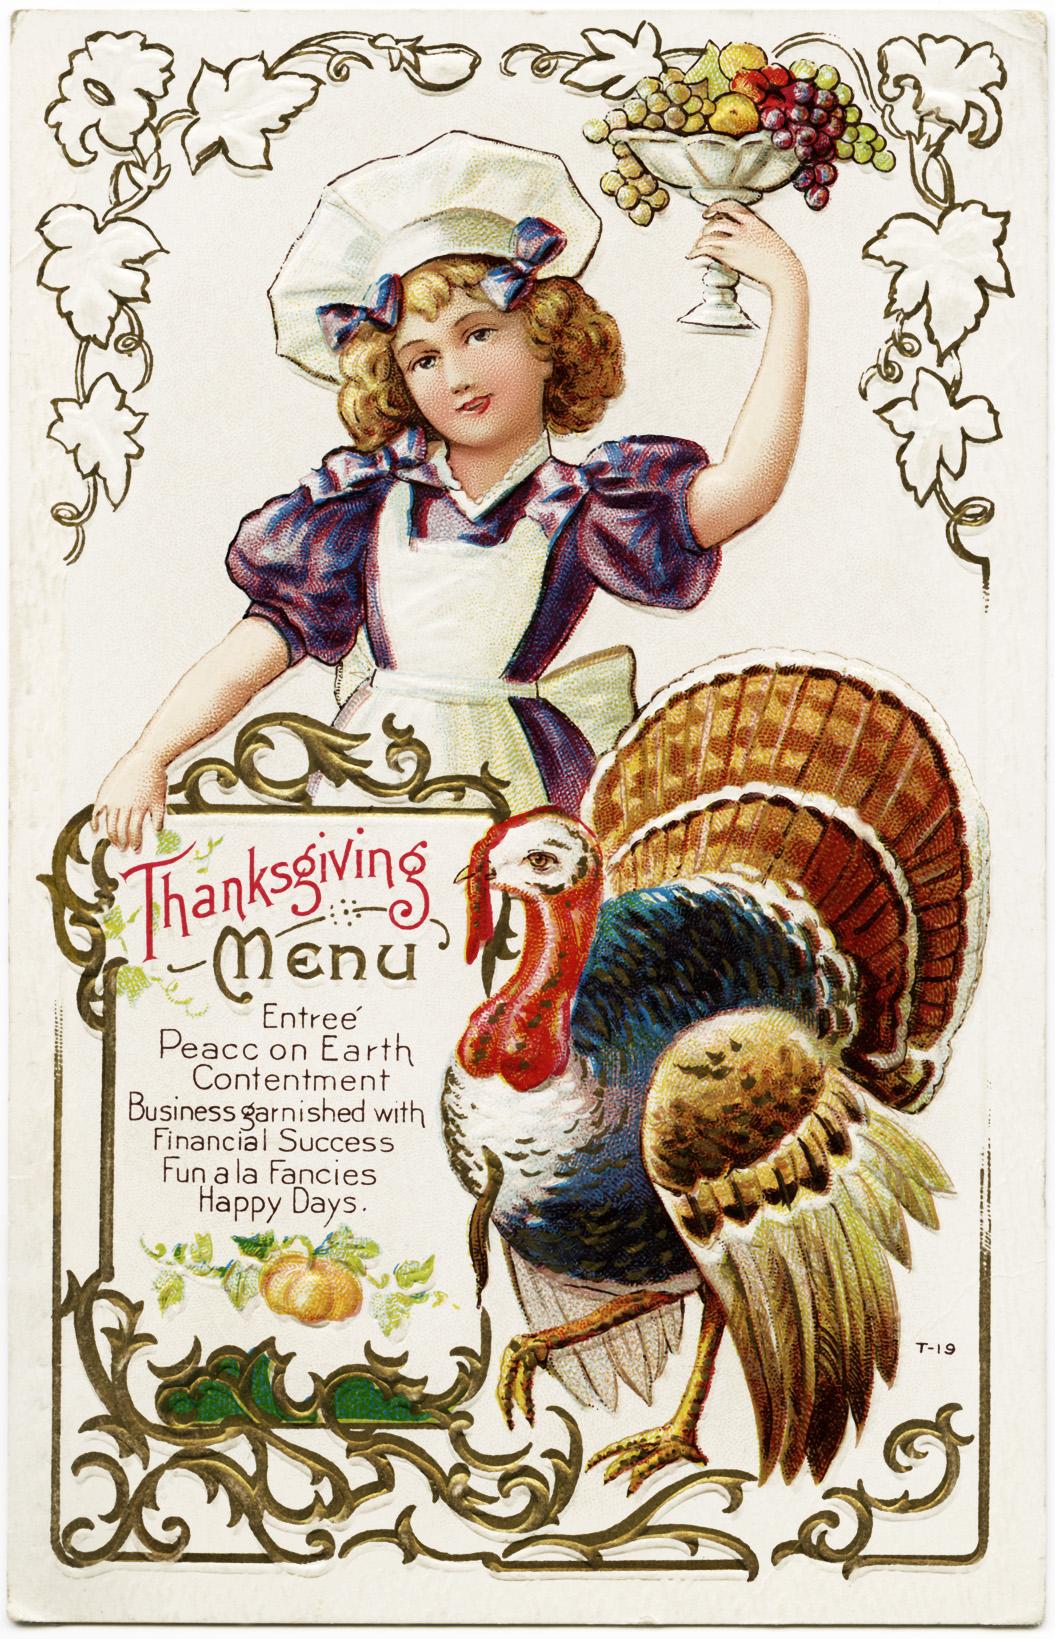 Turkey Day Hercules Style: Free Vintage Thanksgiving Menu Postcard